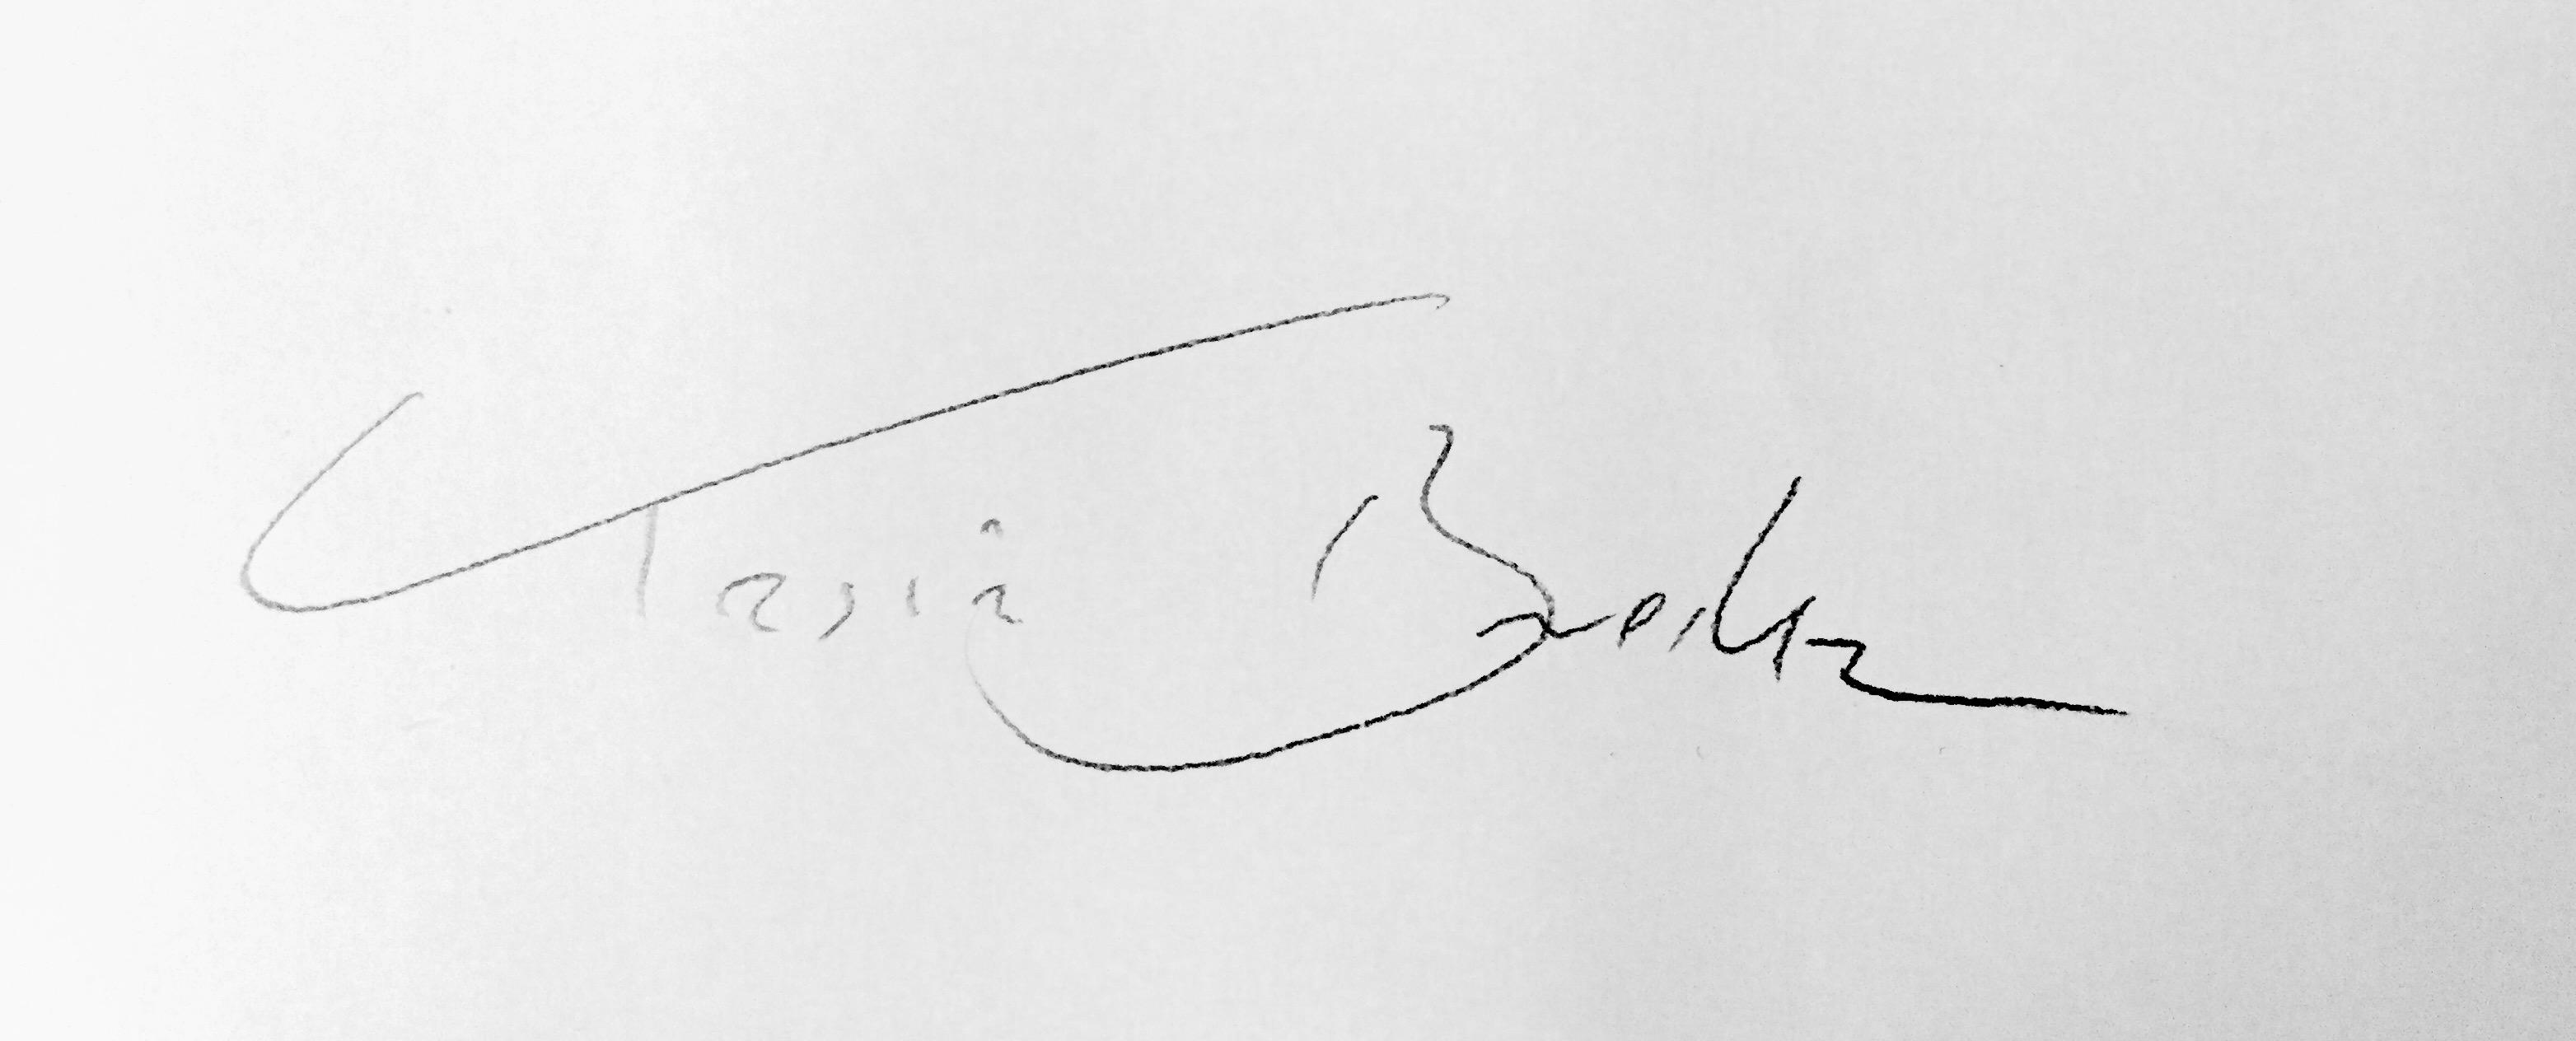 Kasia Breska Signature